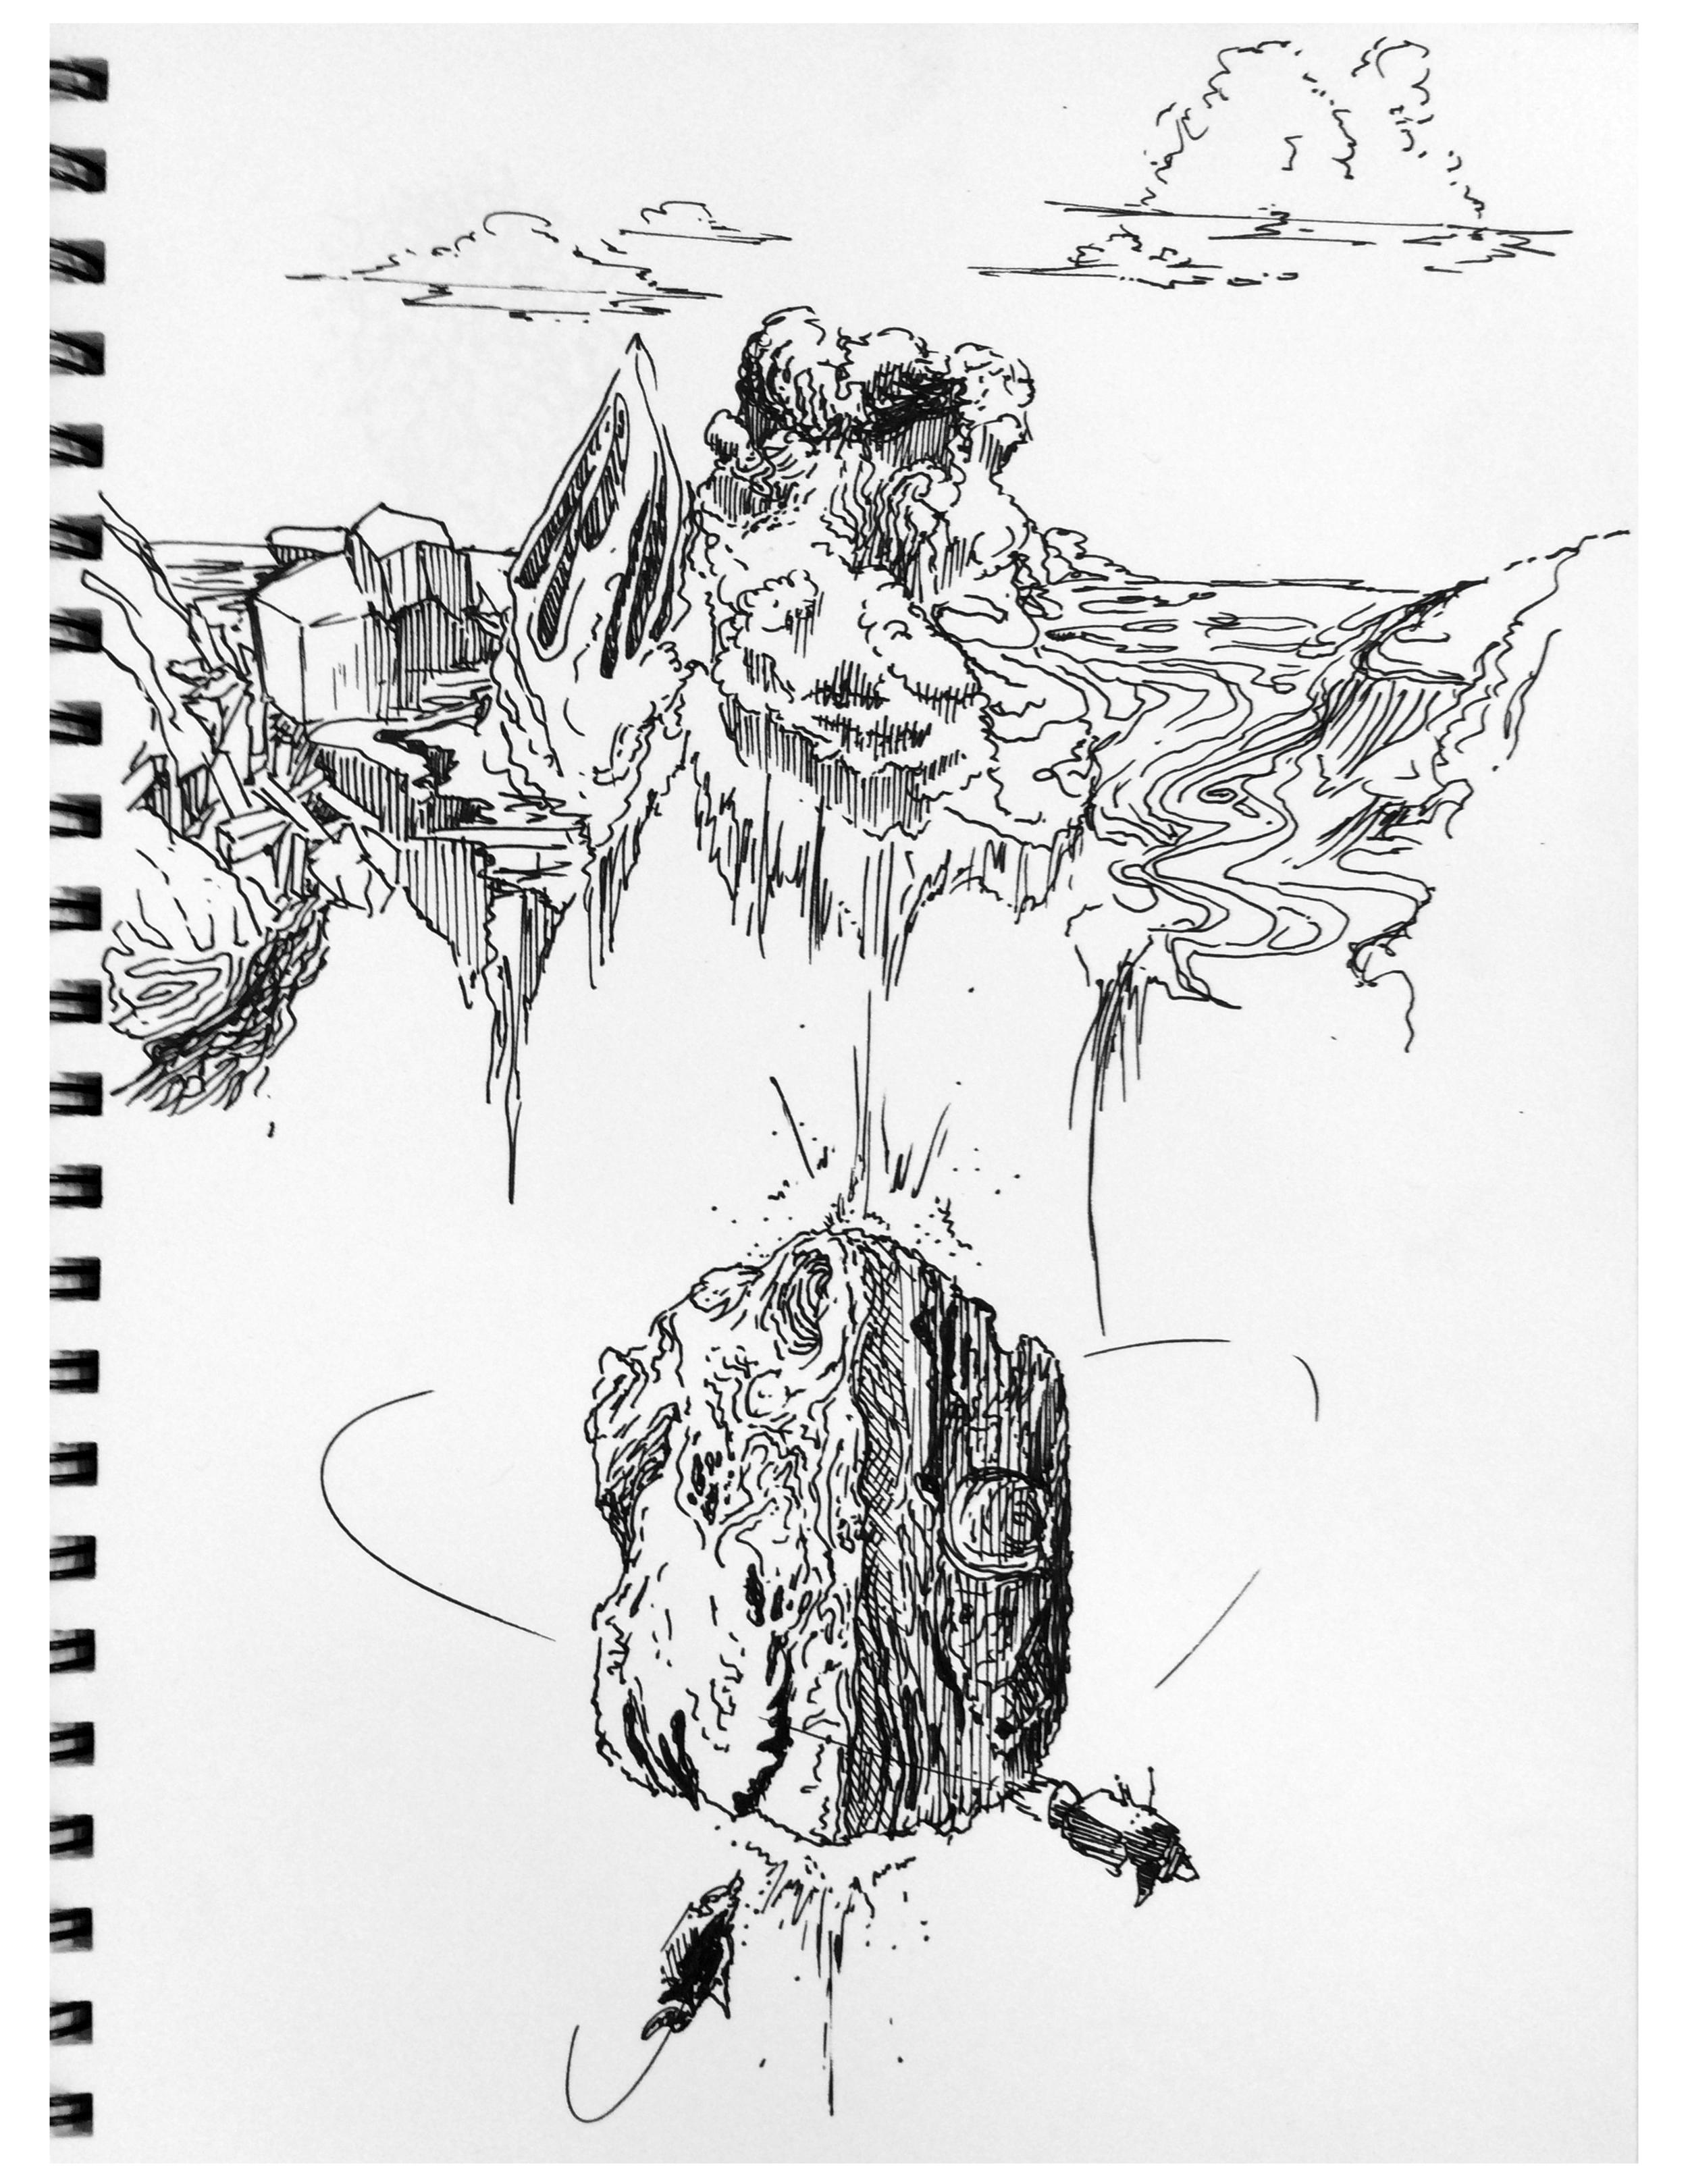 117-sketchbookcollab.jpg